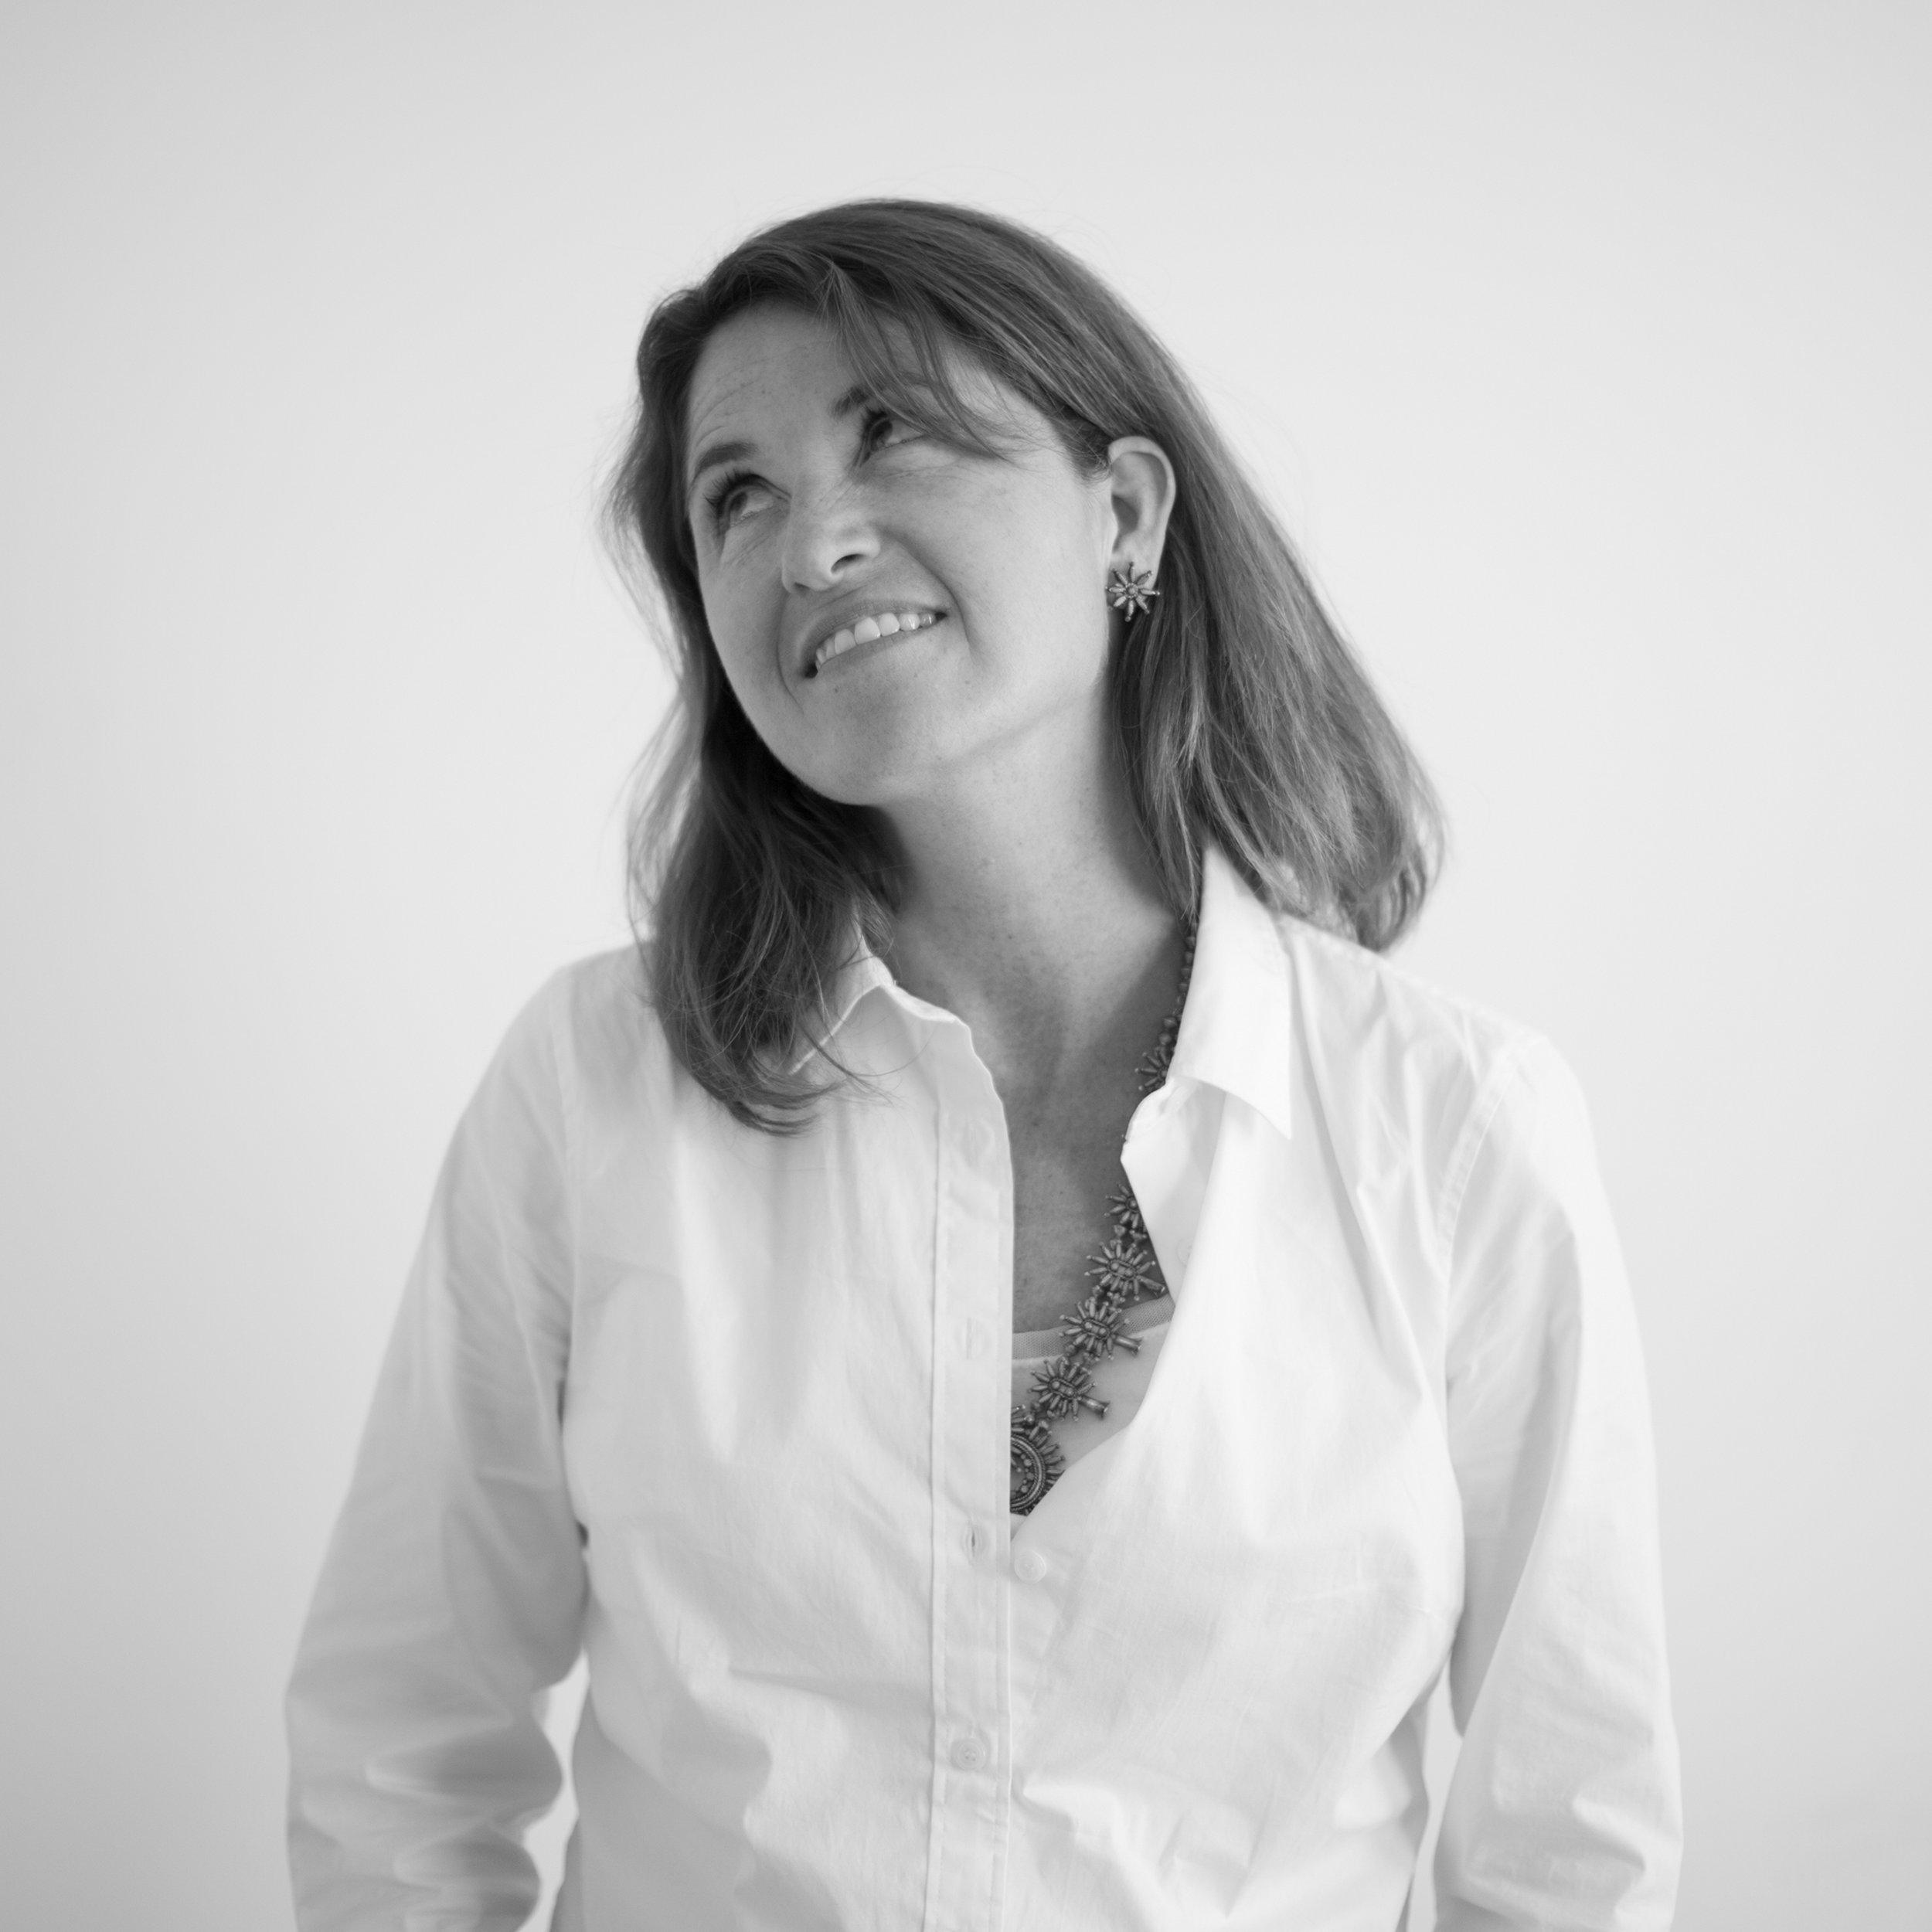 "<a href=""https://www.linkedin.com/in/andreacutright""><b>Andrea Cutright</b><br>Founder, Partner</a>"